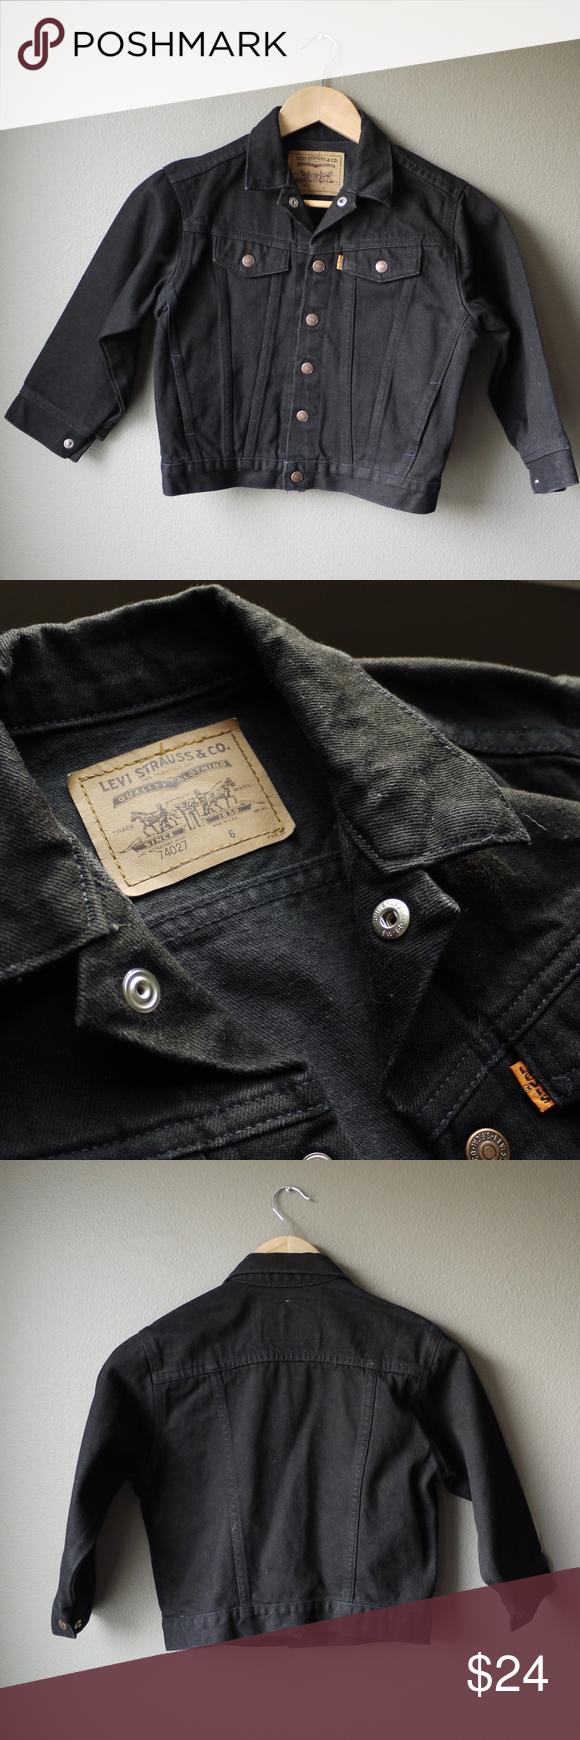 Levi Denim Jean Jacket Boys Or Girls Pinterest Black Denim